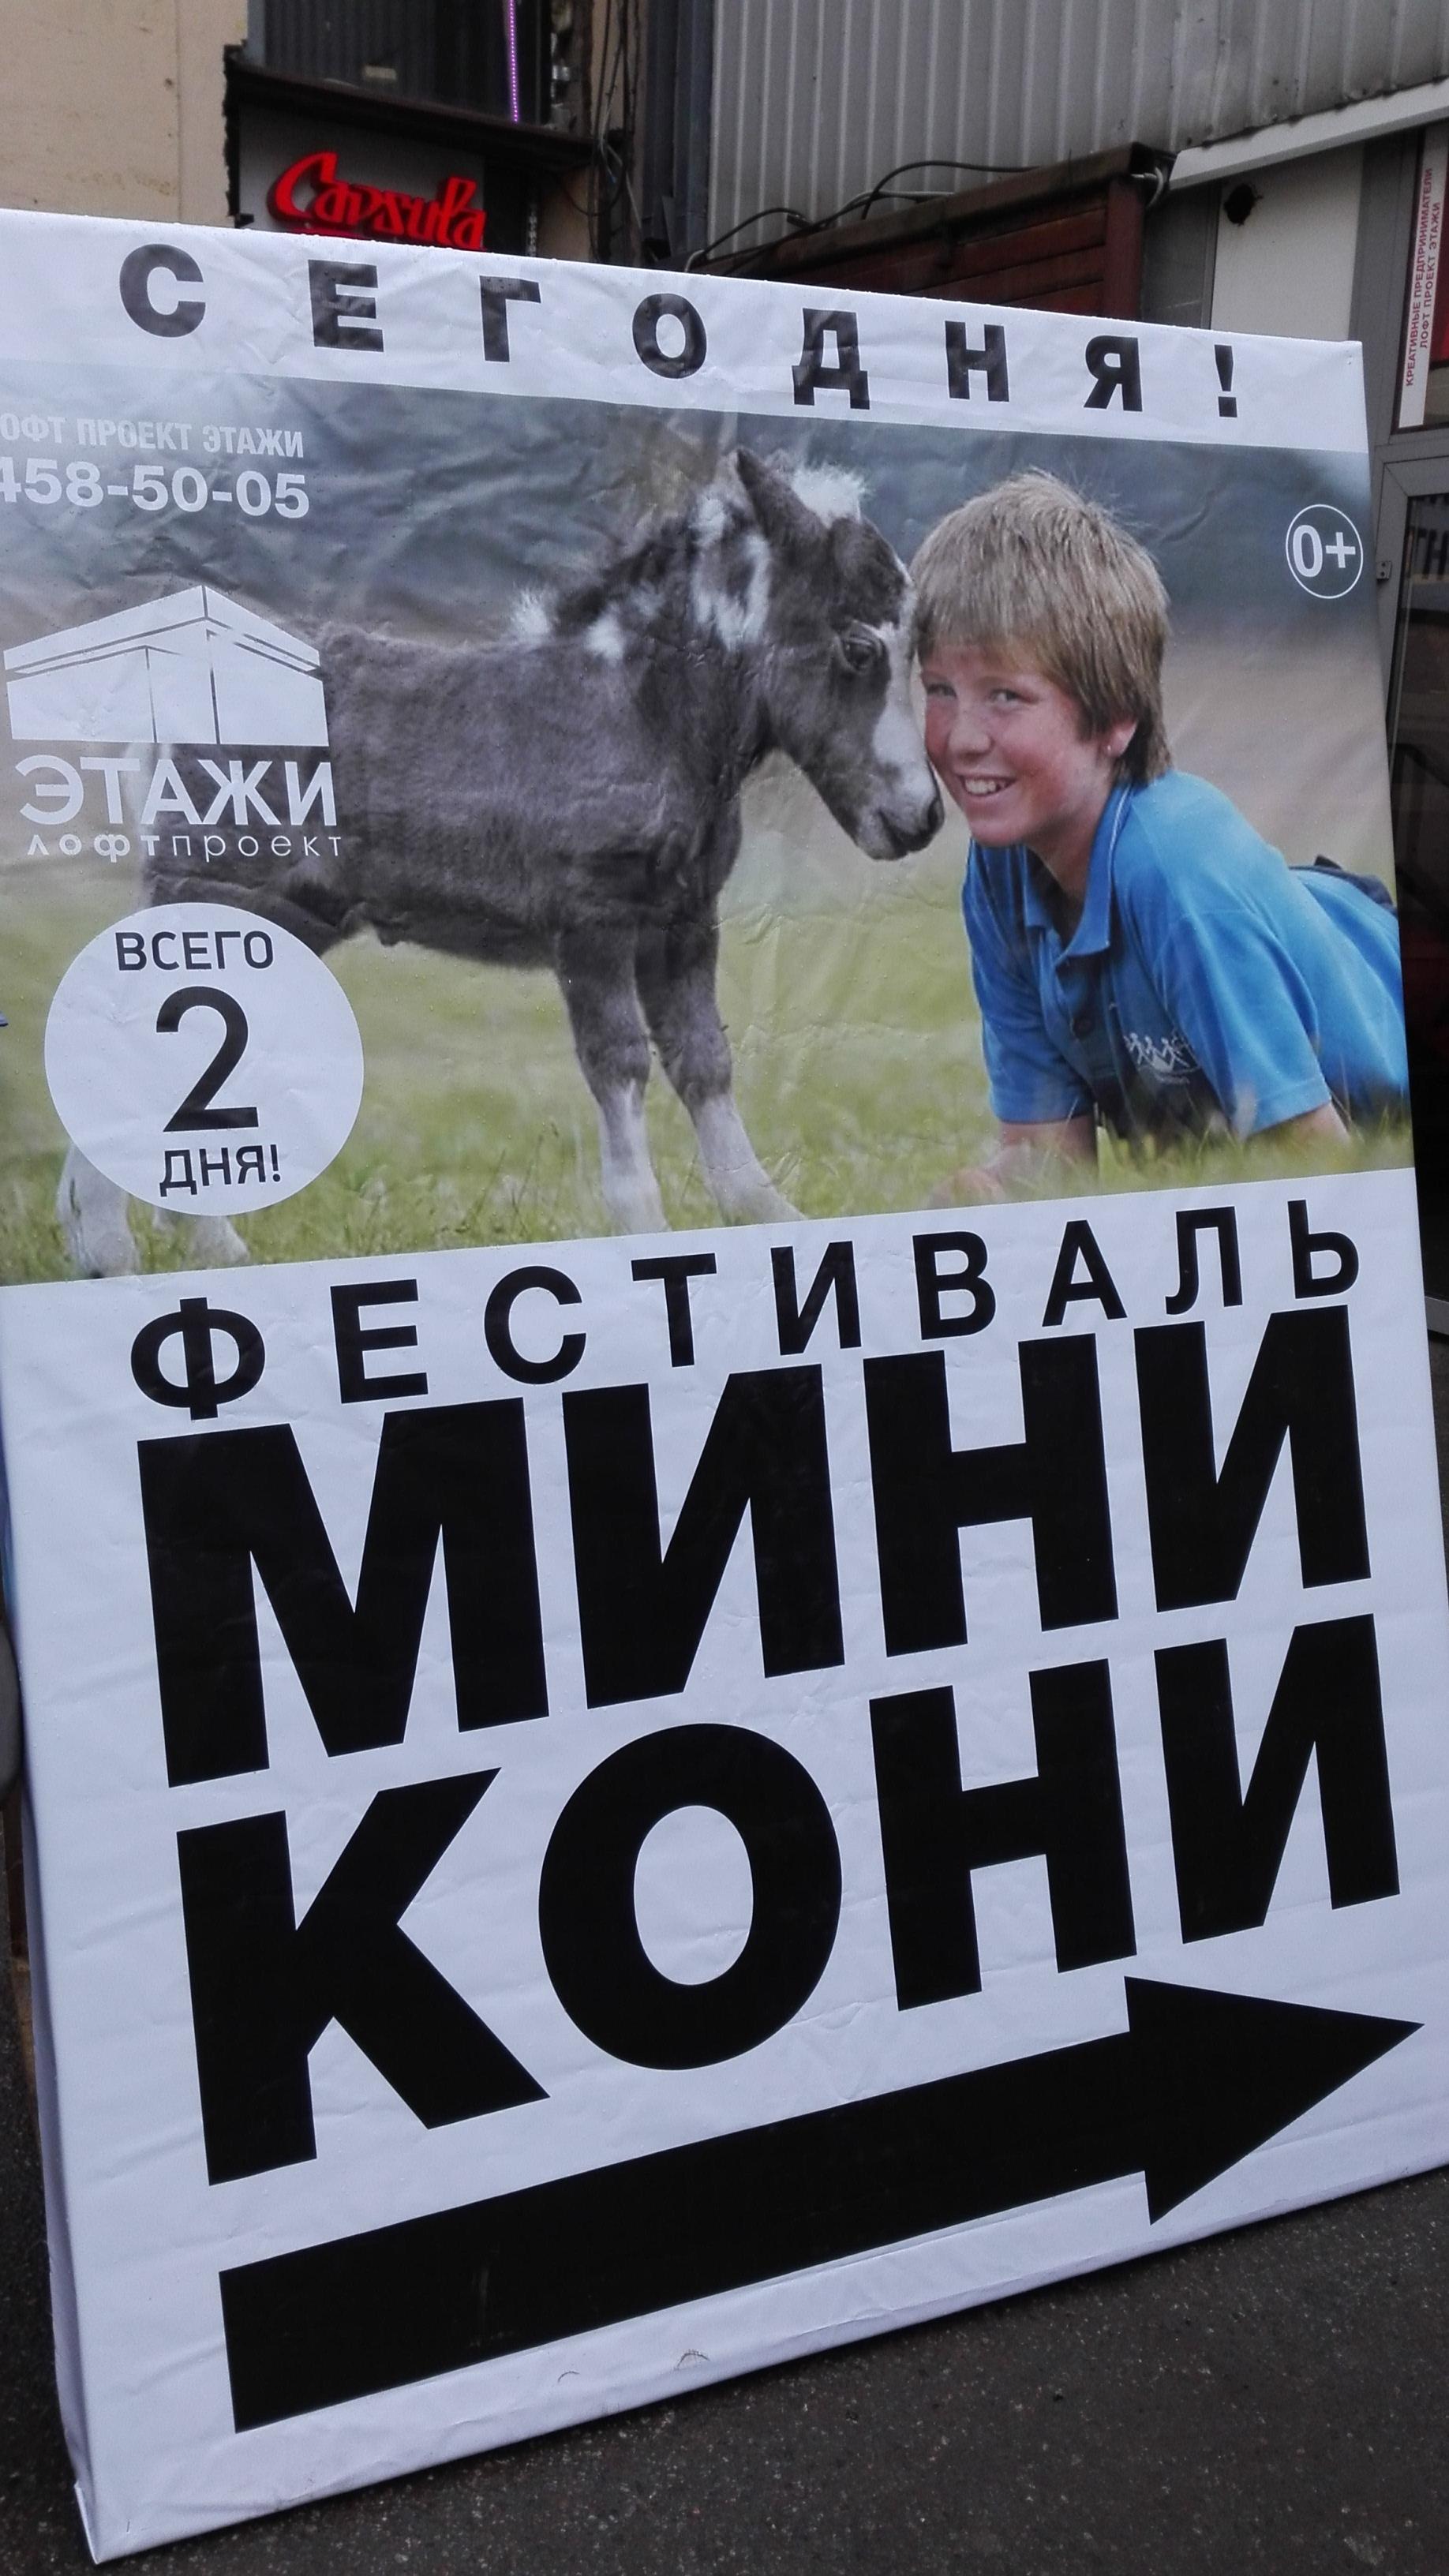 Мини-кони в Санкт-Петербурге